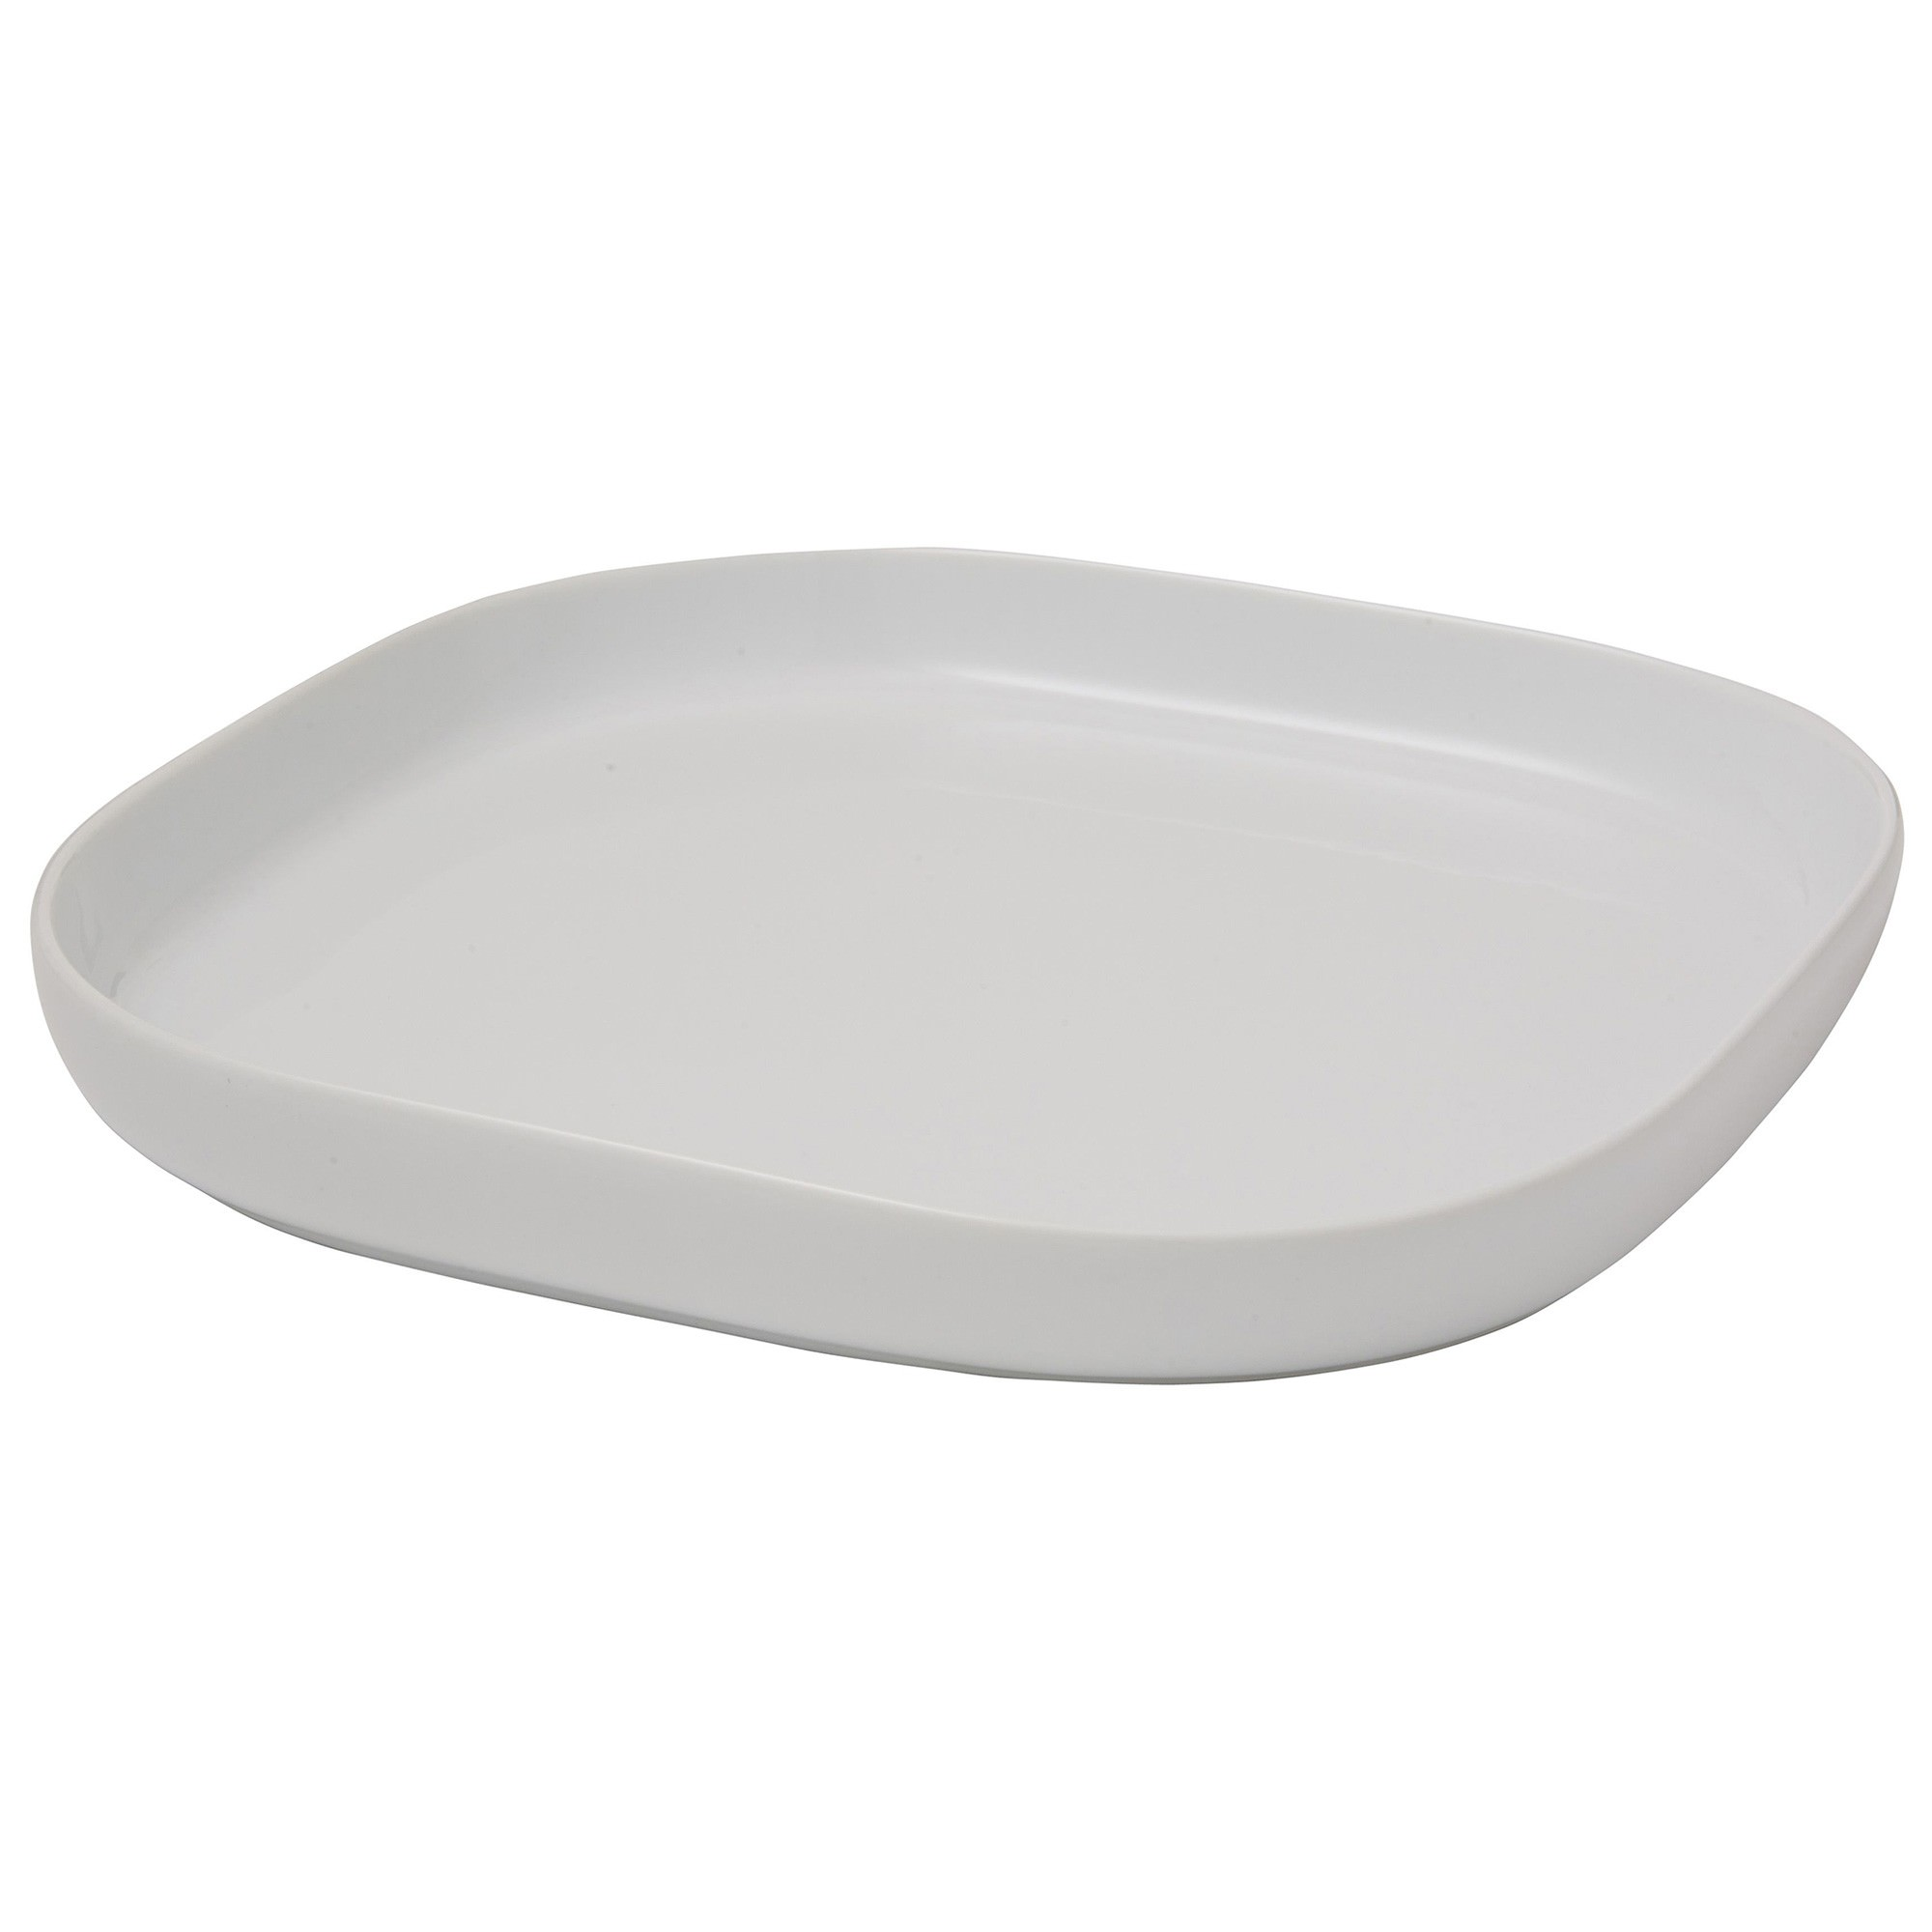 Loft Porcelain Square Platter